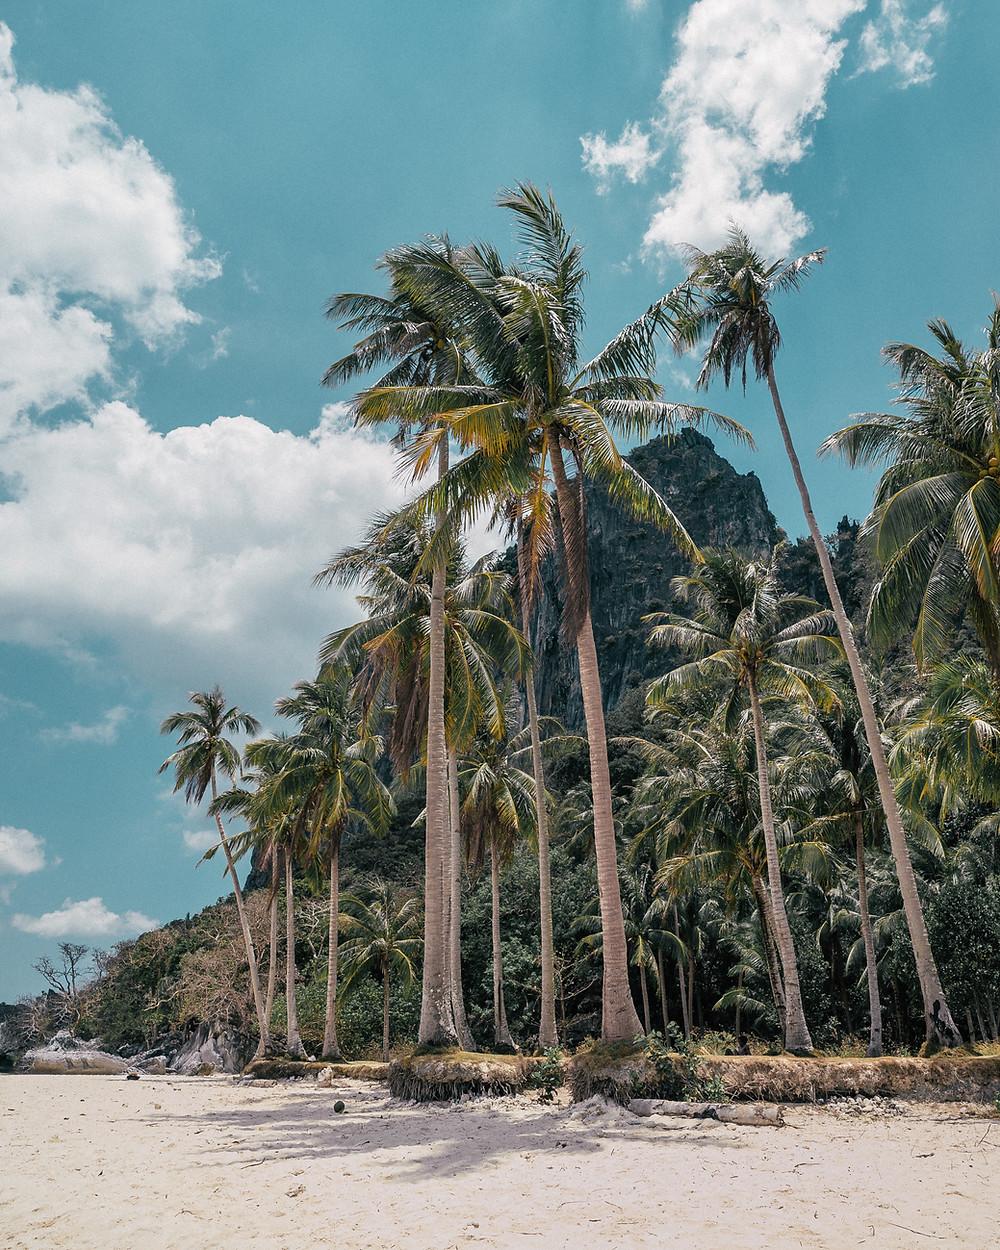 Pinagbuyutan Island, El Nido, Palawan, The Philippines